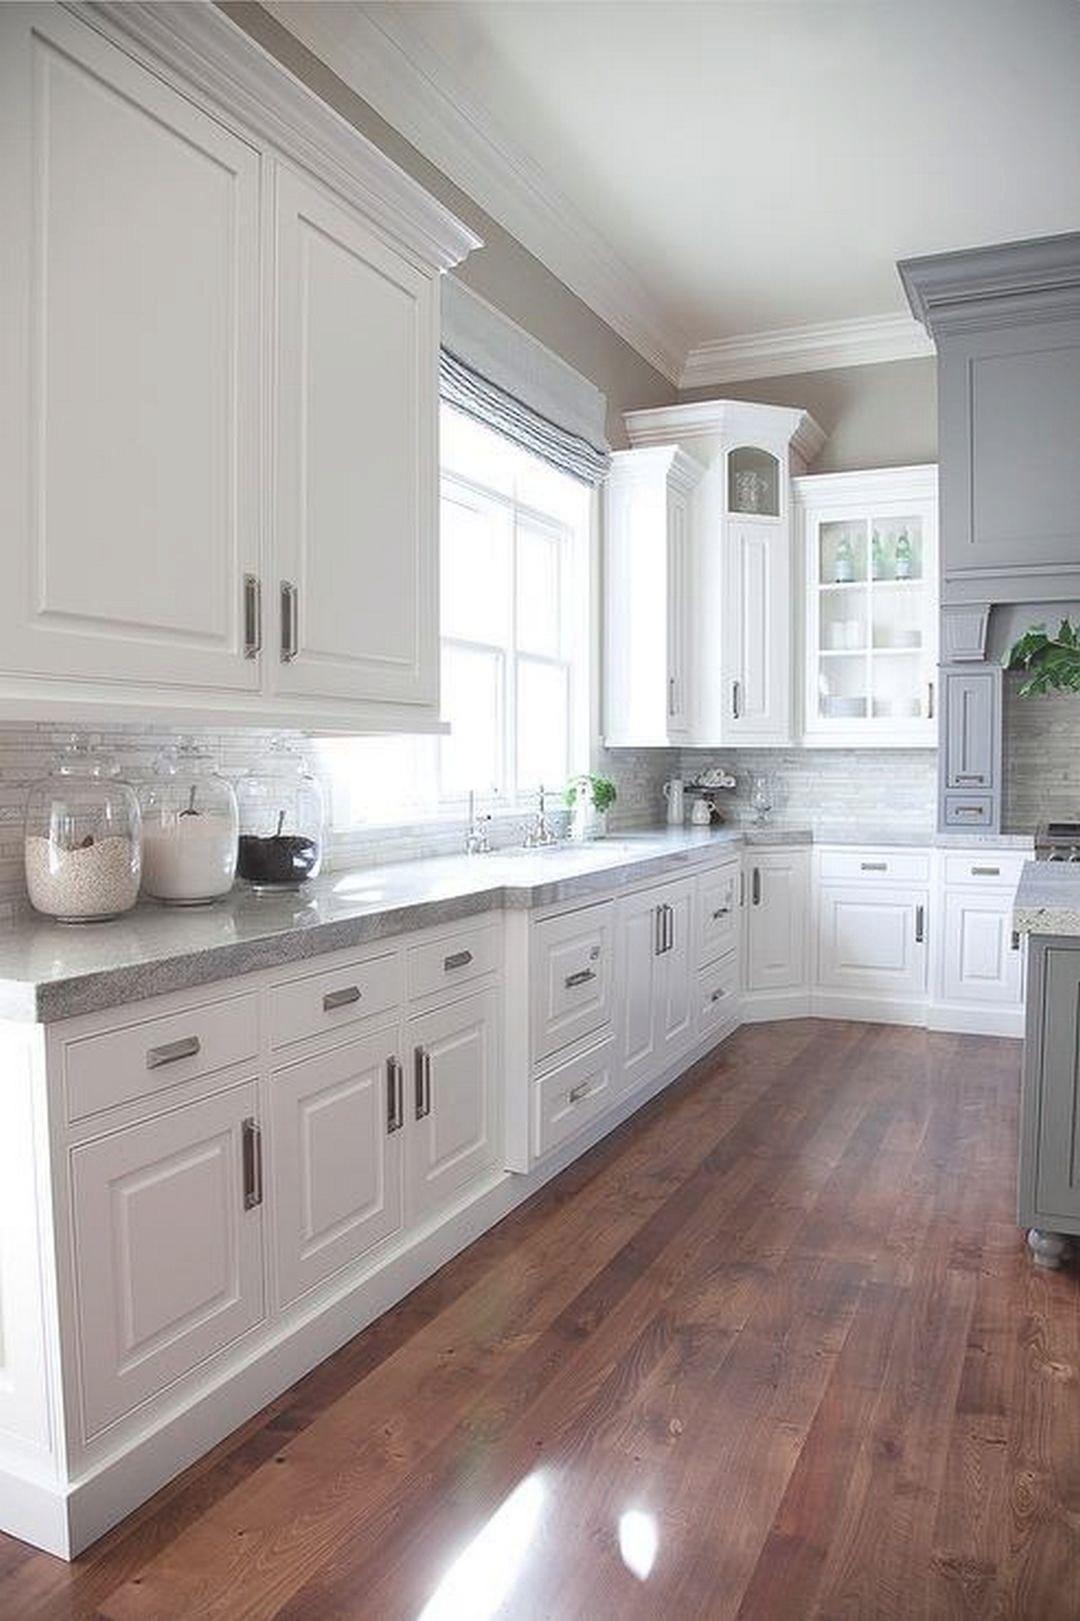 Kitchen Ideas Grey And White Latest Kitchen Designs White Kitchen Design White Kitchen Interior